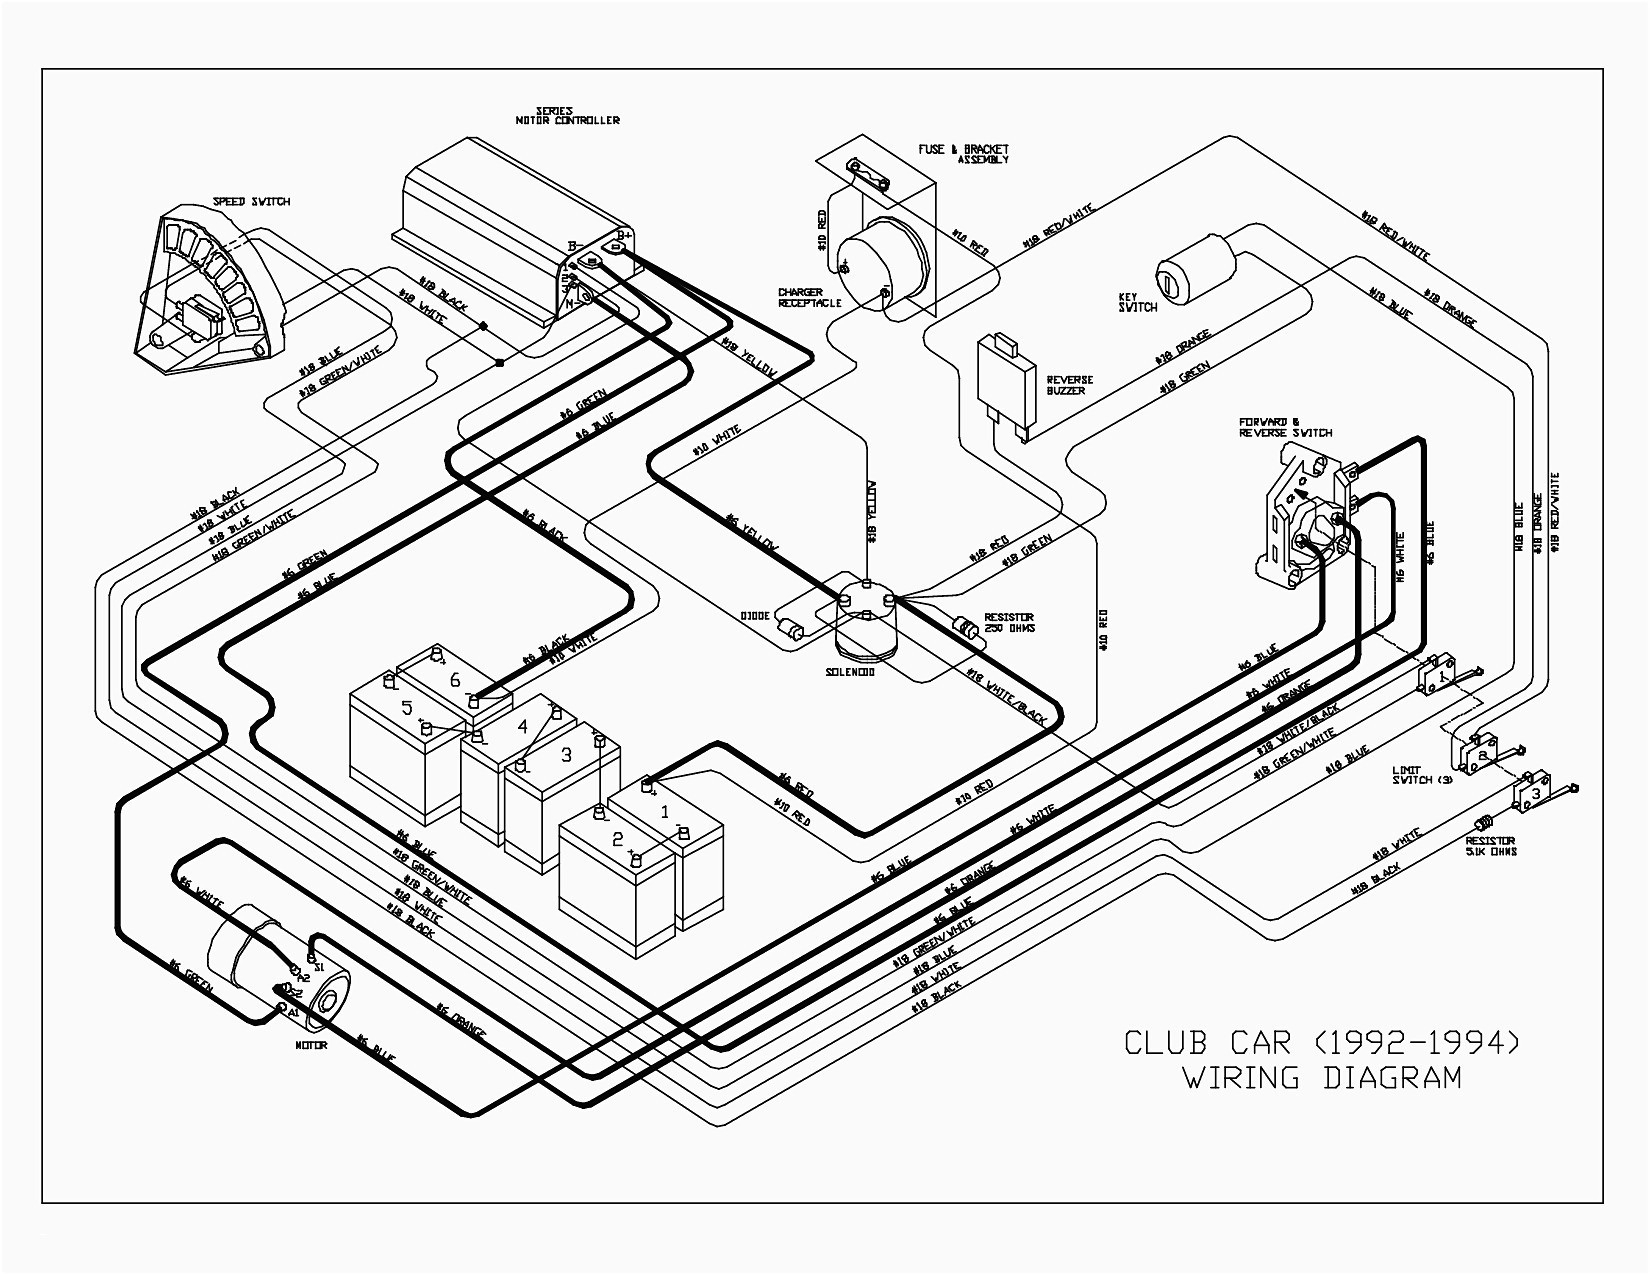 club car wiring schematic Collection-Wiring Diagram for Club Car Golf Cart Save Wiring Diagram for Club Car Precedent New Golf 9-t